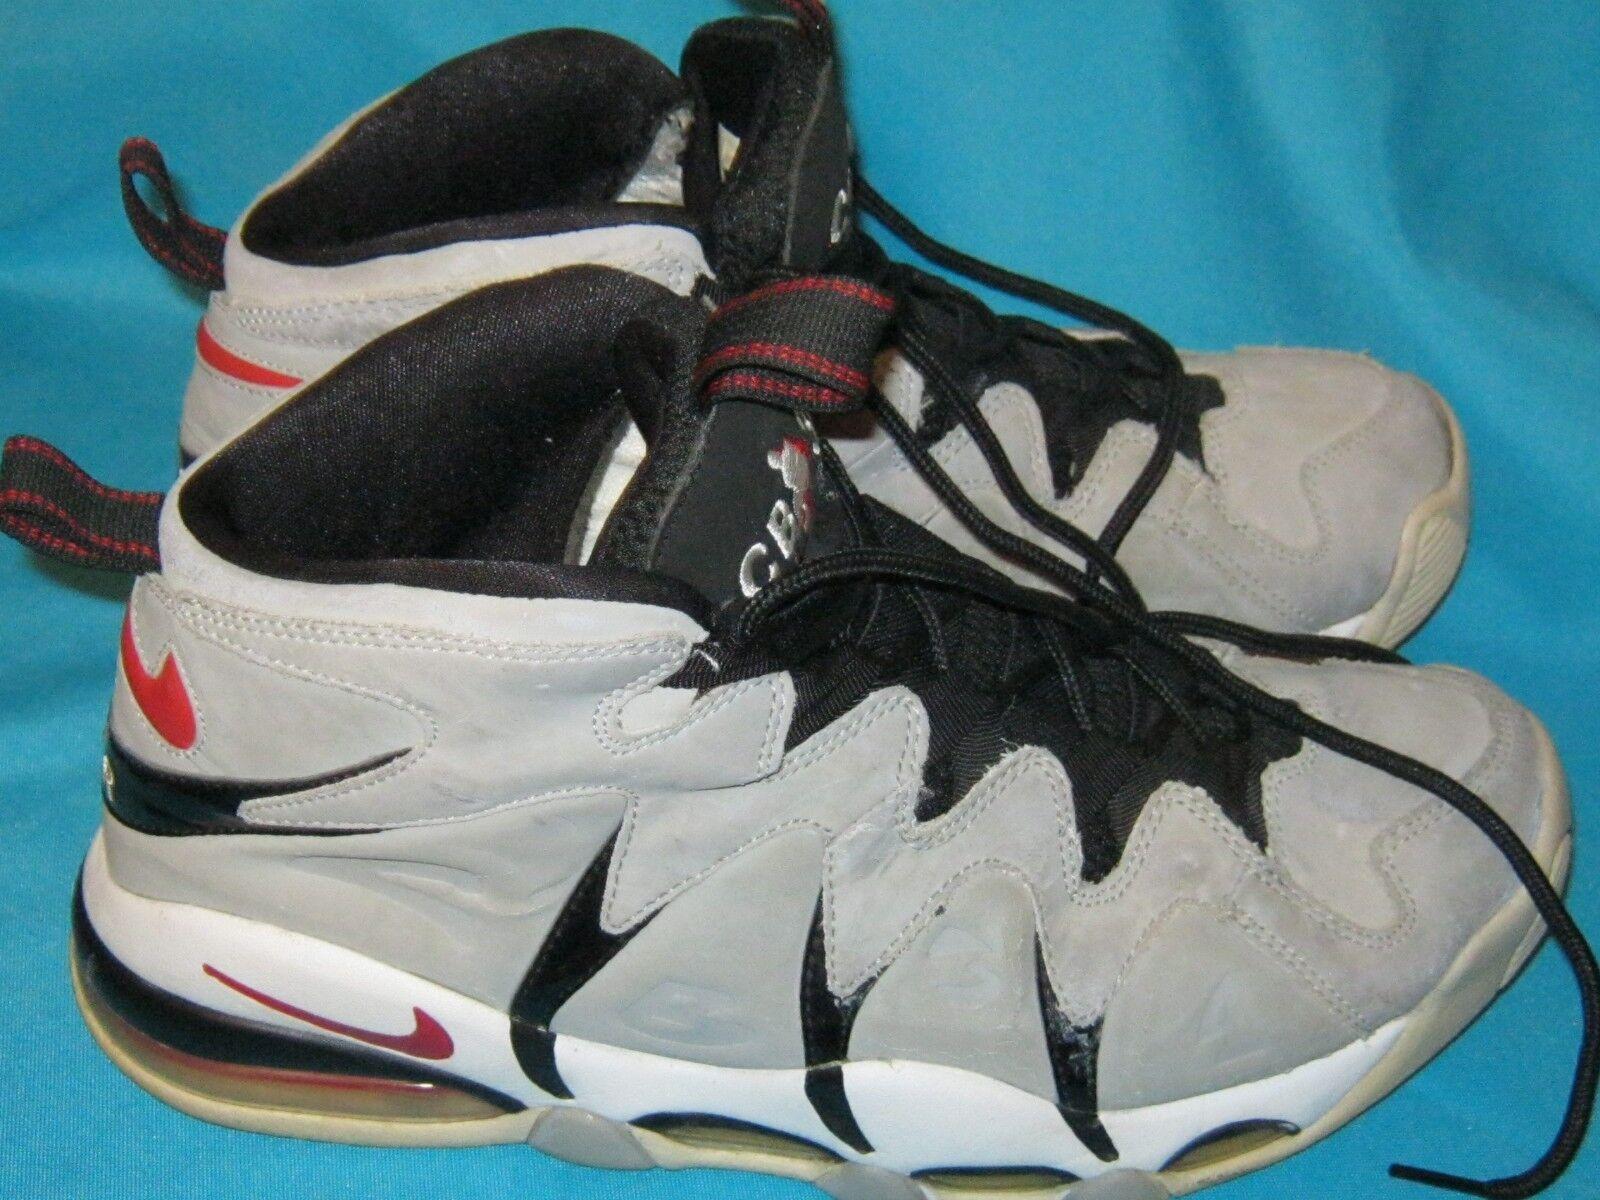 Nike air cb34 max charles barkley cb34 air lupo grigio, grigio misura 10,5